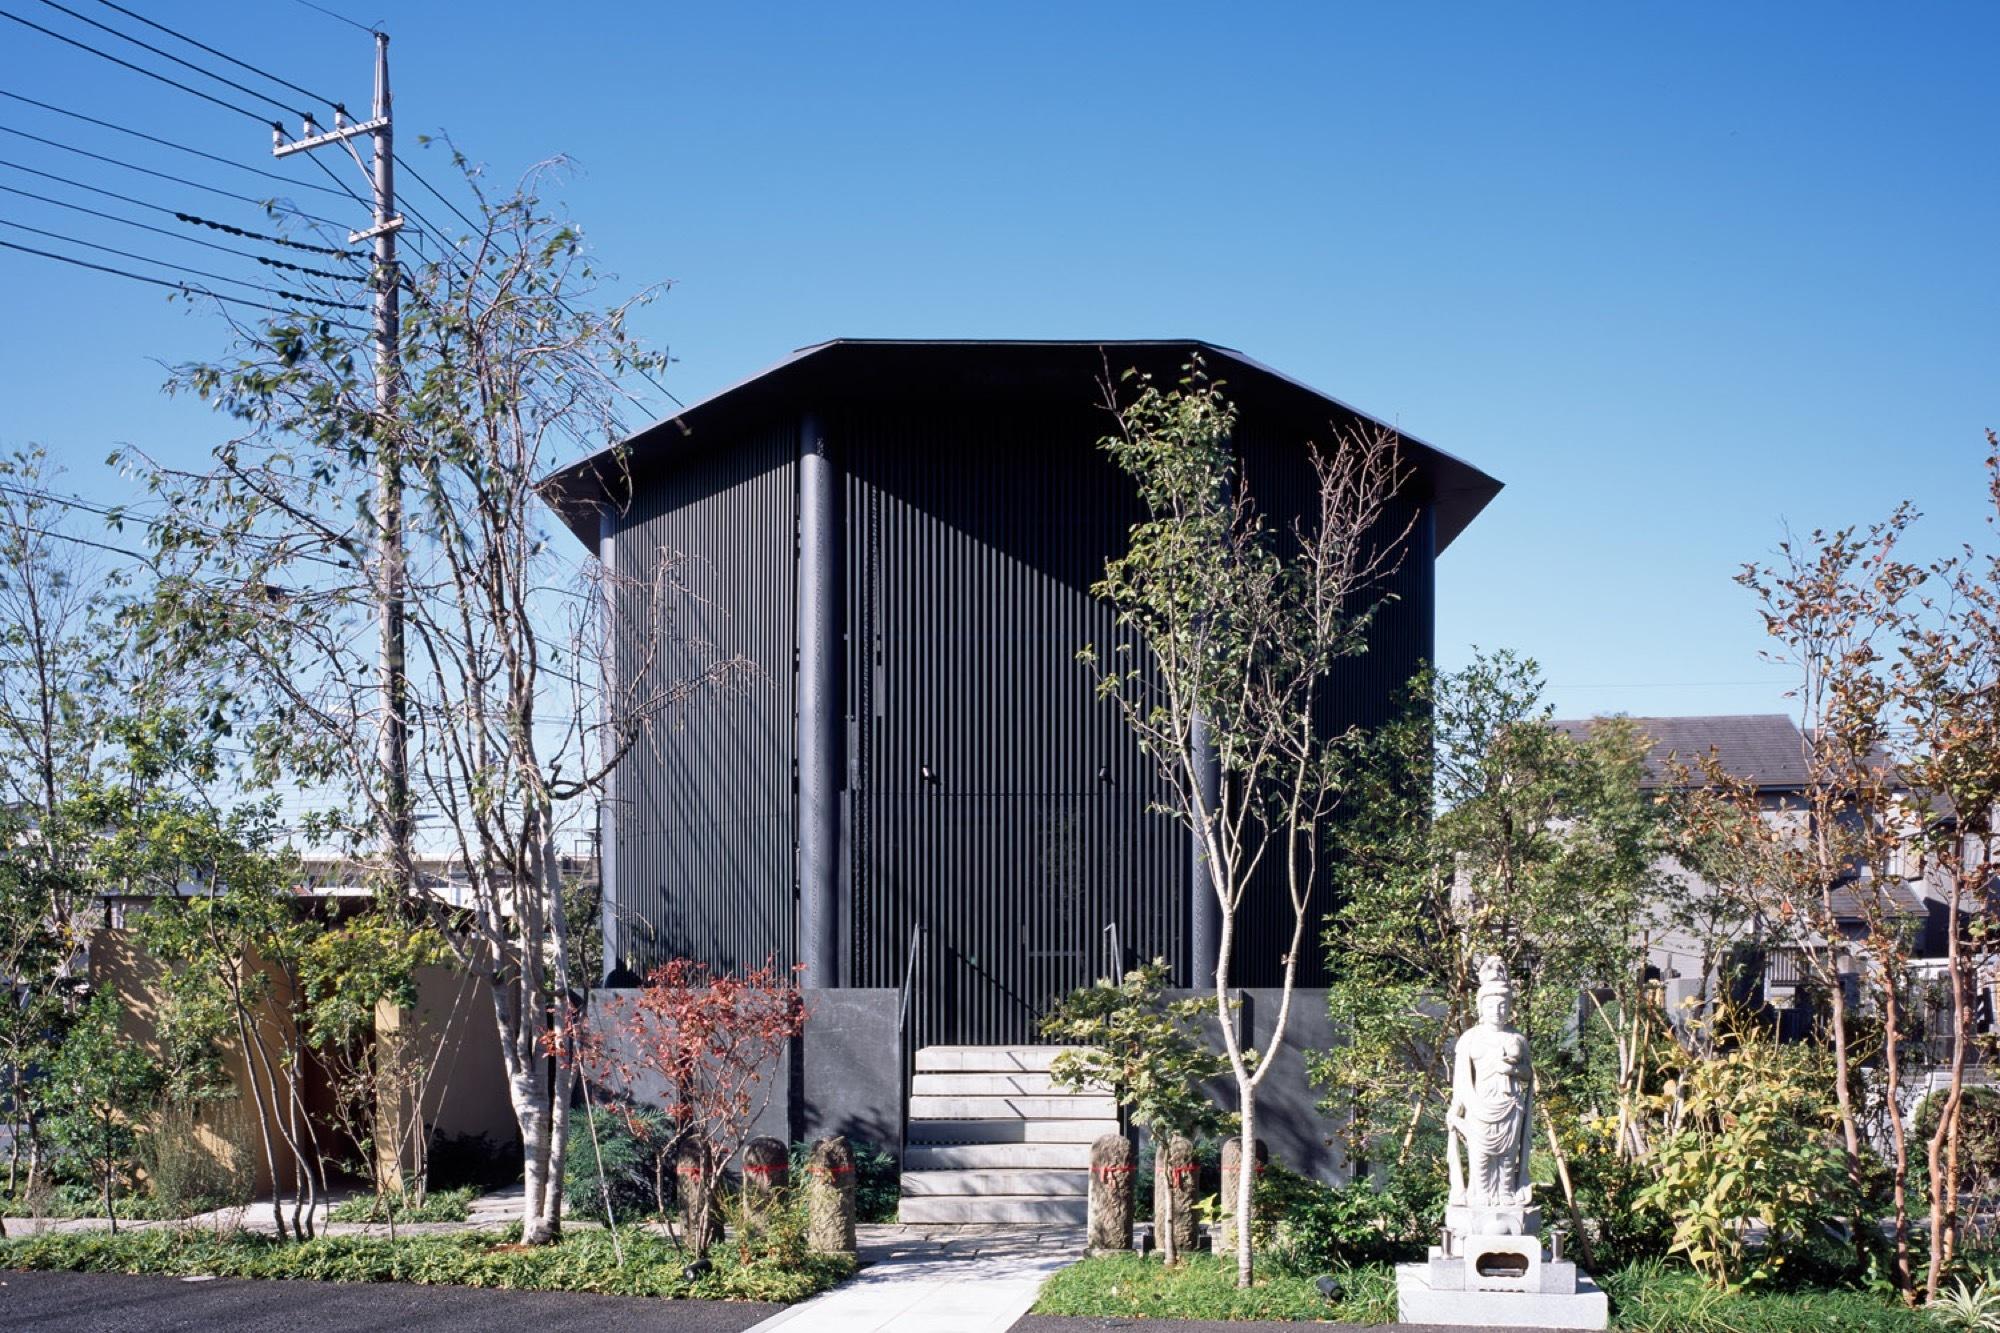 hasshoden charnel house in ryusenji temple love architecture aarchitect office hideki